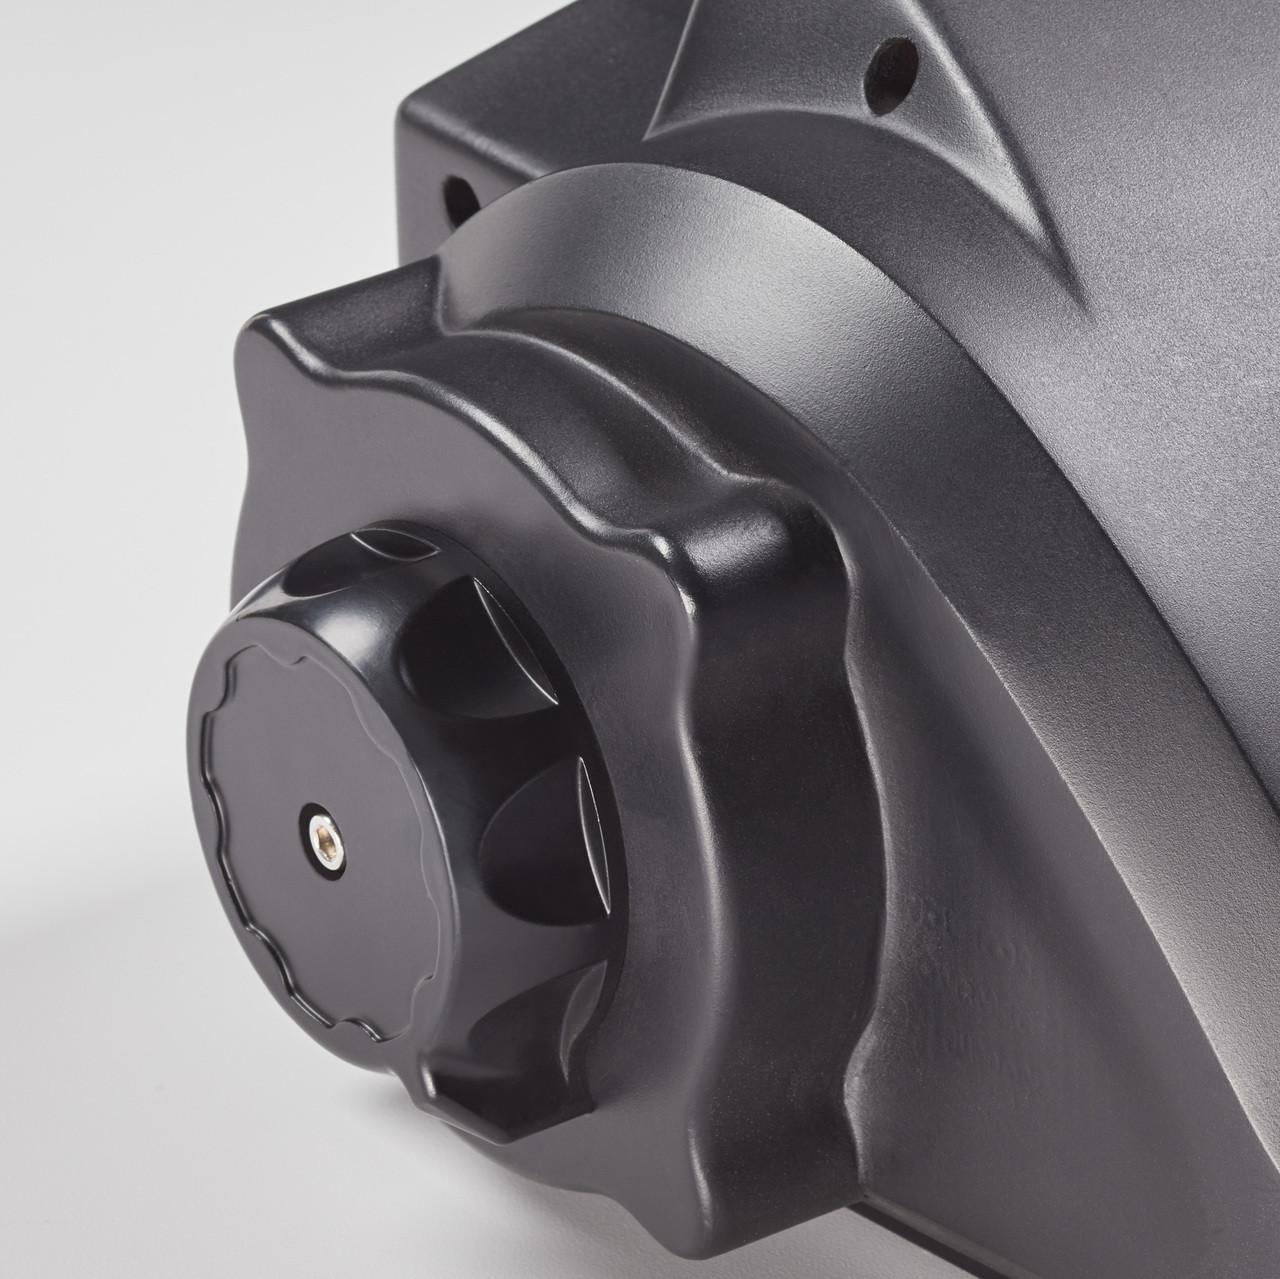 500621 --- FULTON Electric Marine Winch - 10,000 lb Capacity